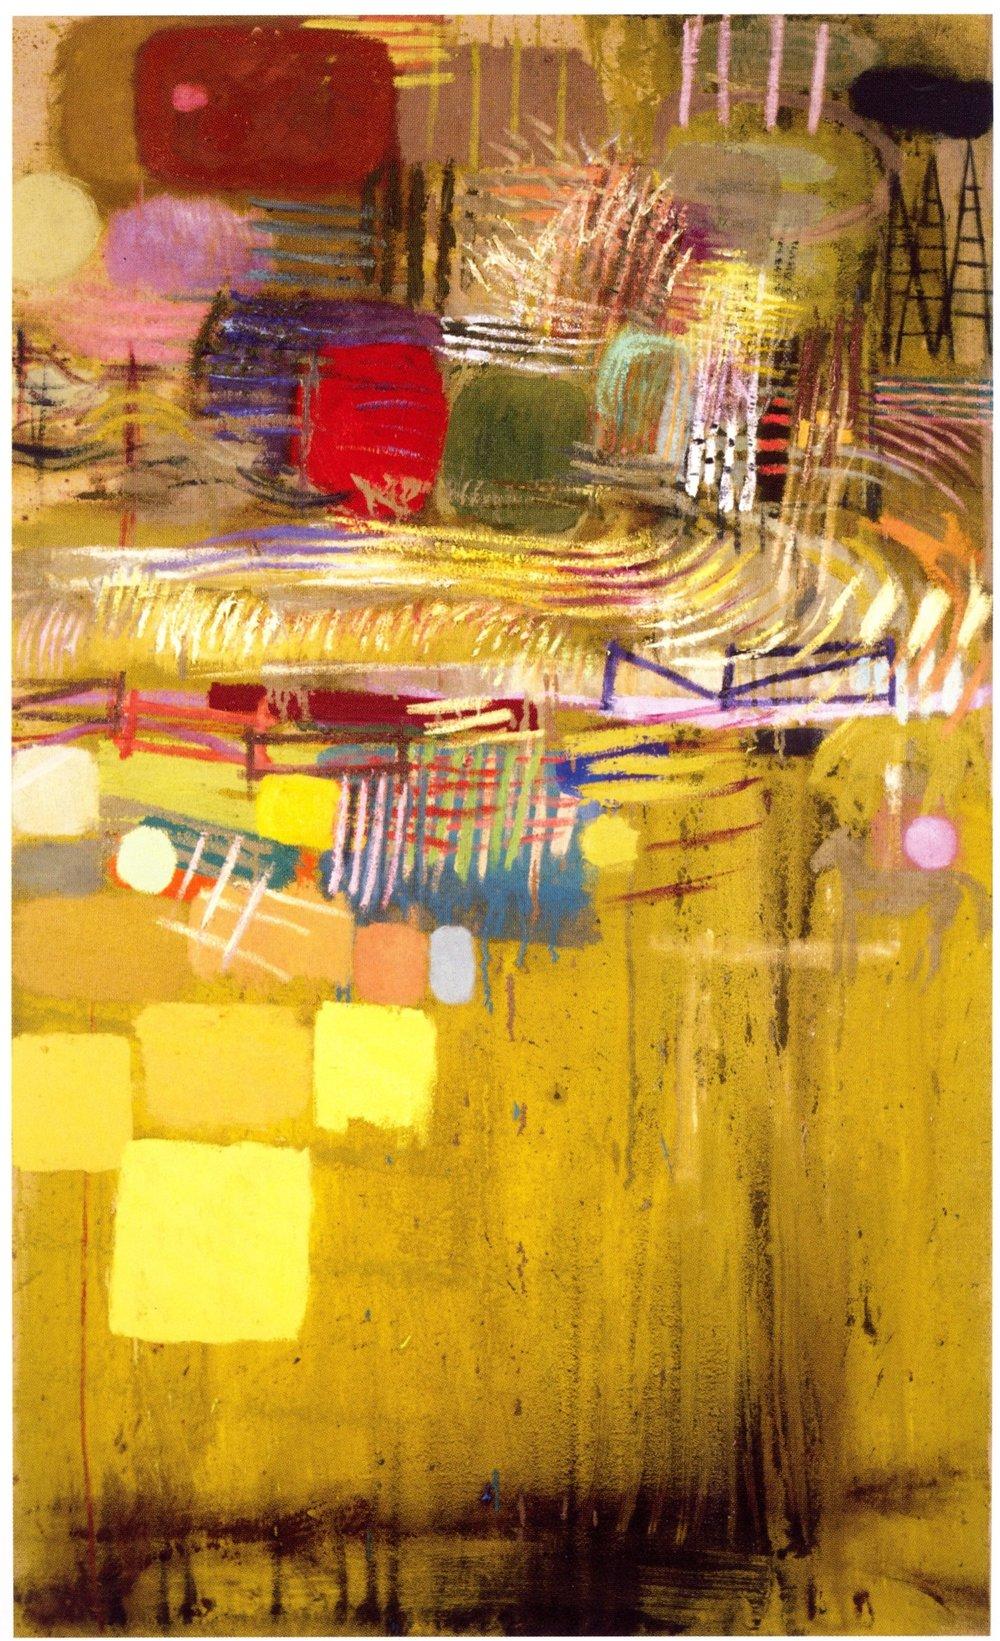 "Mark Kurdziel    Last Exit,   Oil on canvas, 40"" x 66"", 2004"